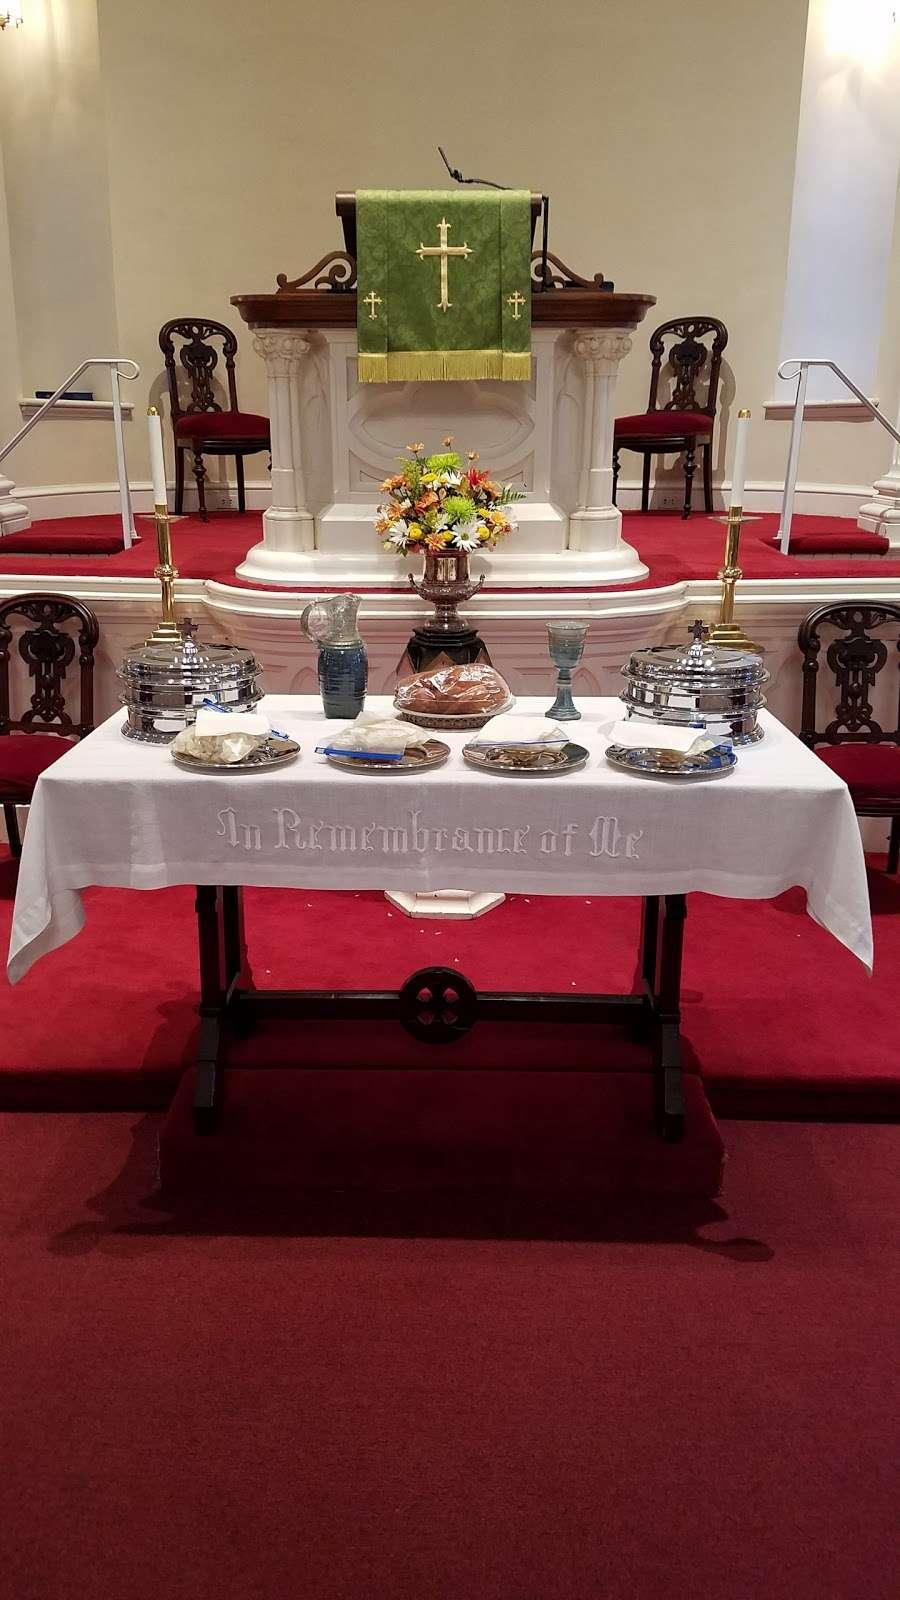 South Presbyterian Church - church  | Photo 9 of 10 | Address: 150 W Church St, Bergenfield, NJ 07621, USA | Phone: (201) 384-8932